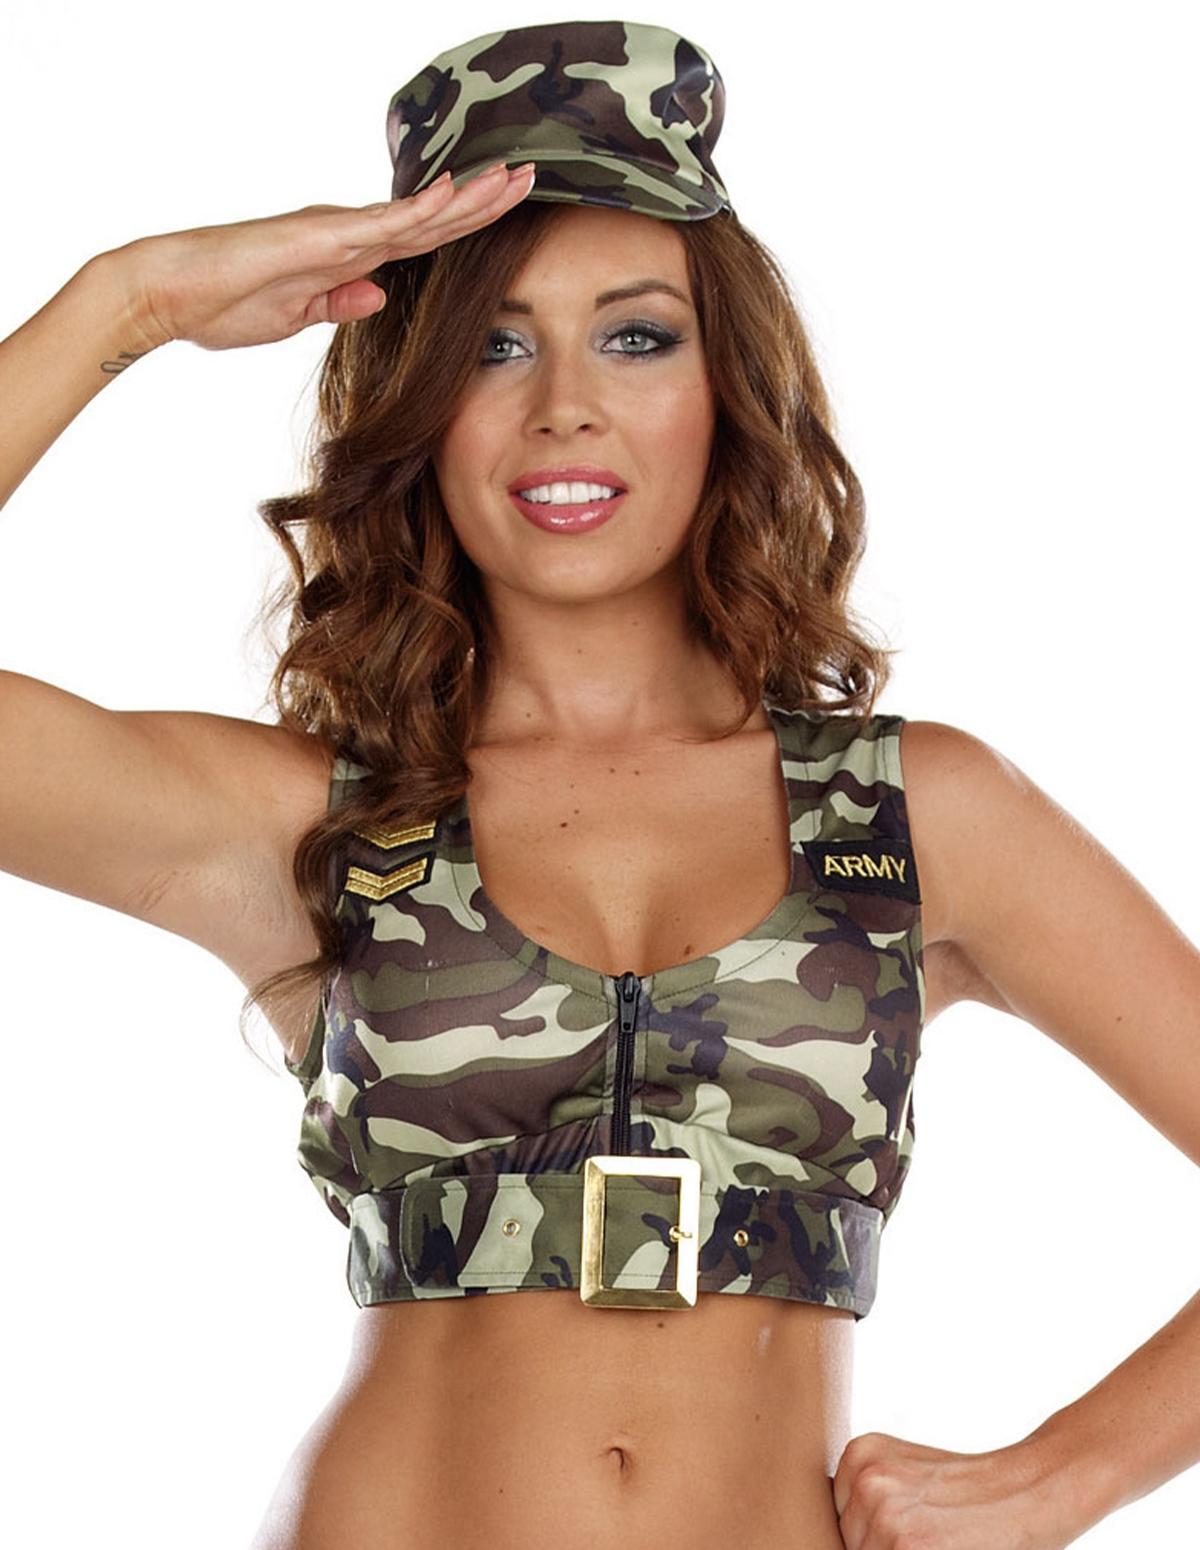 Battalion Babe